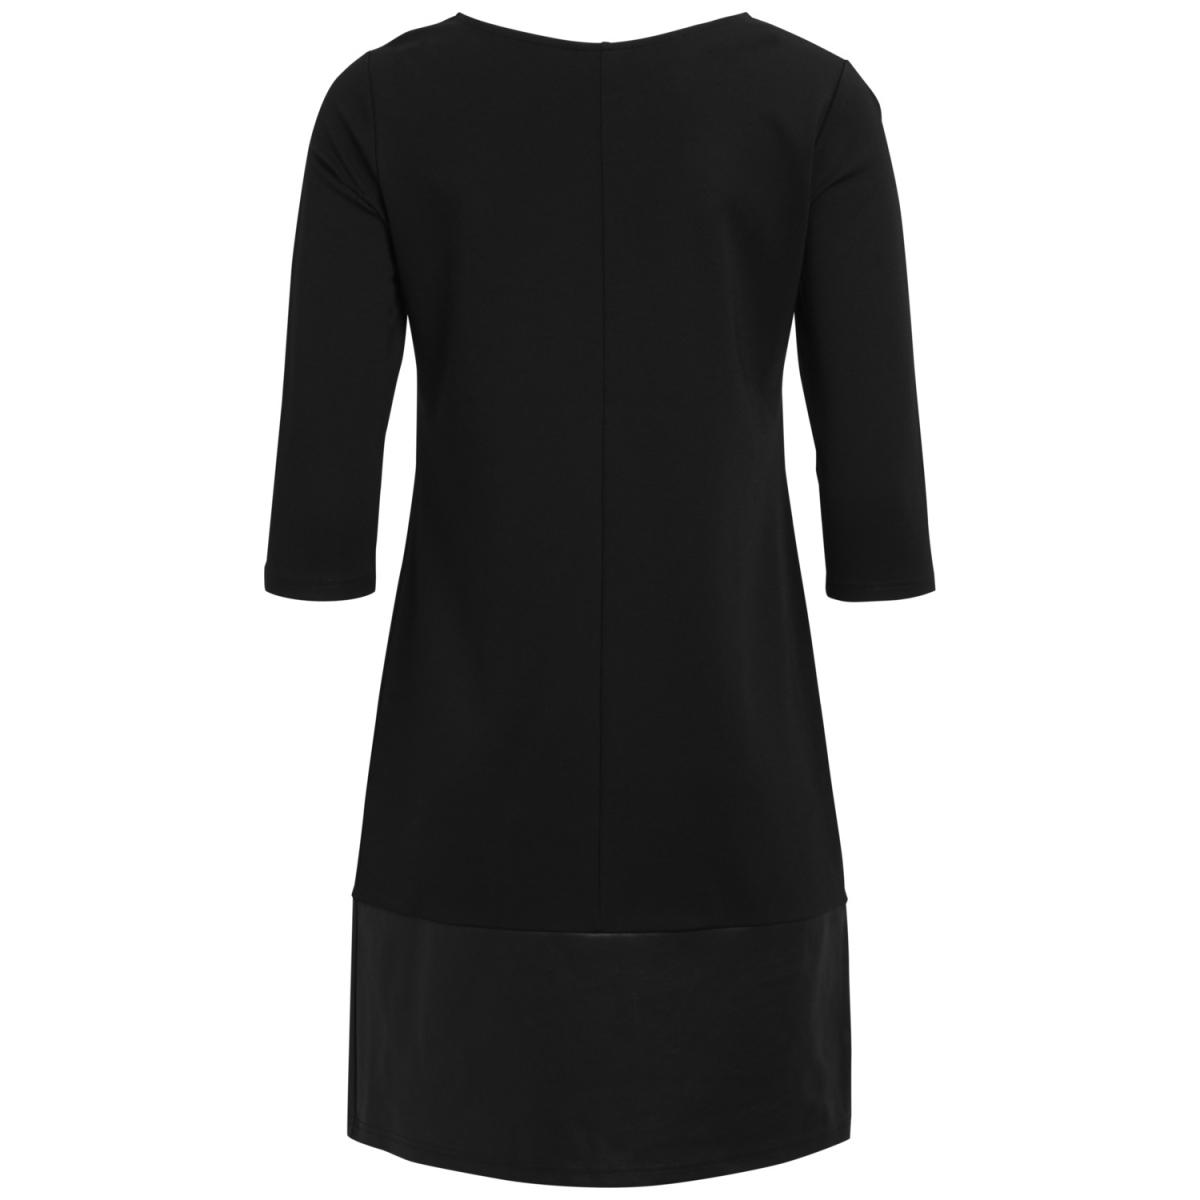 vially 3/4 sleeve dress/1 14045229 vila jurk black